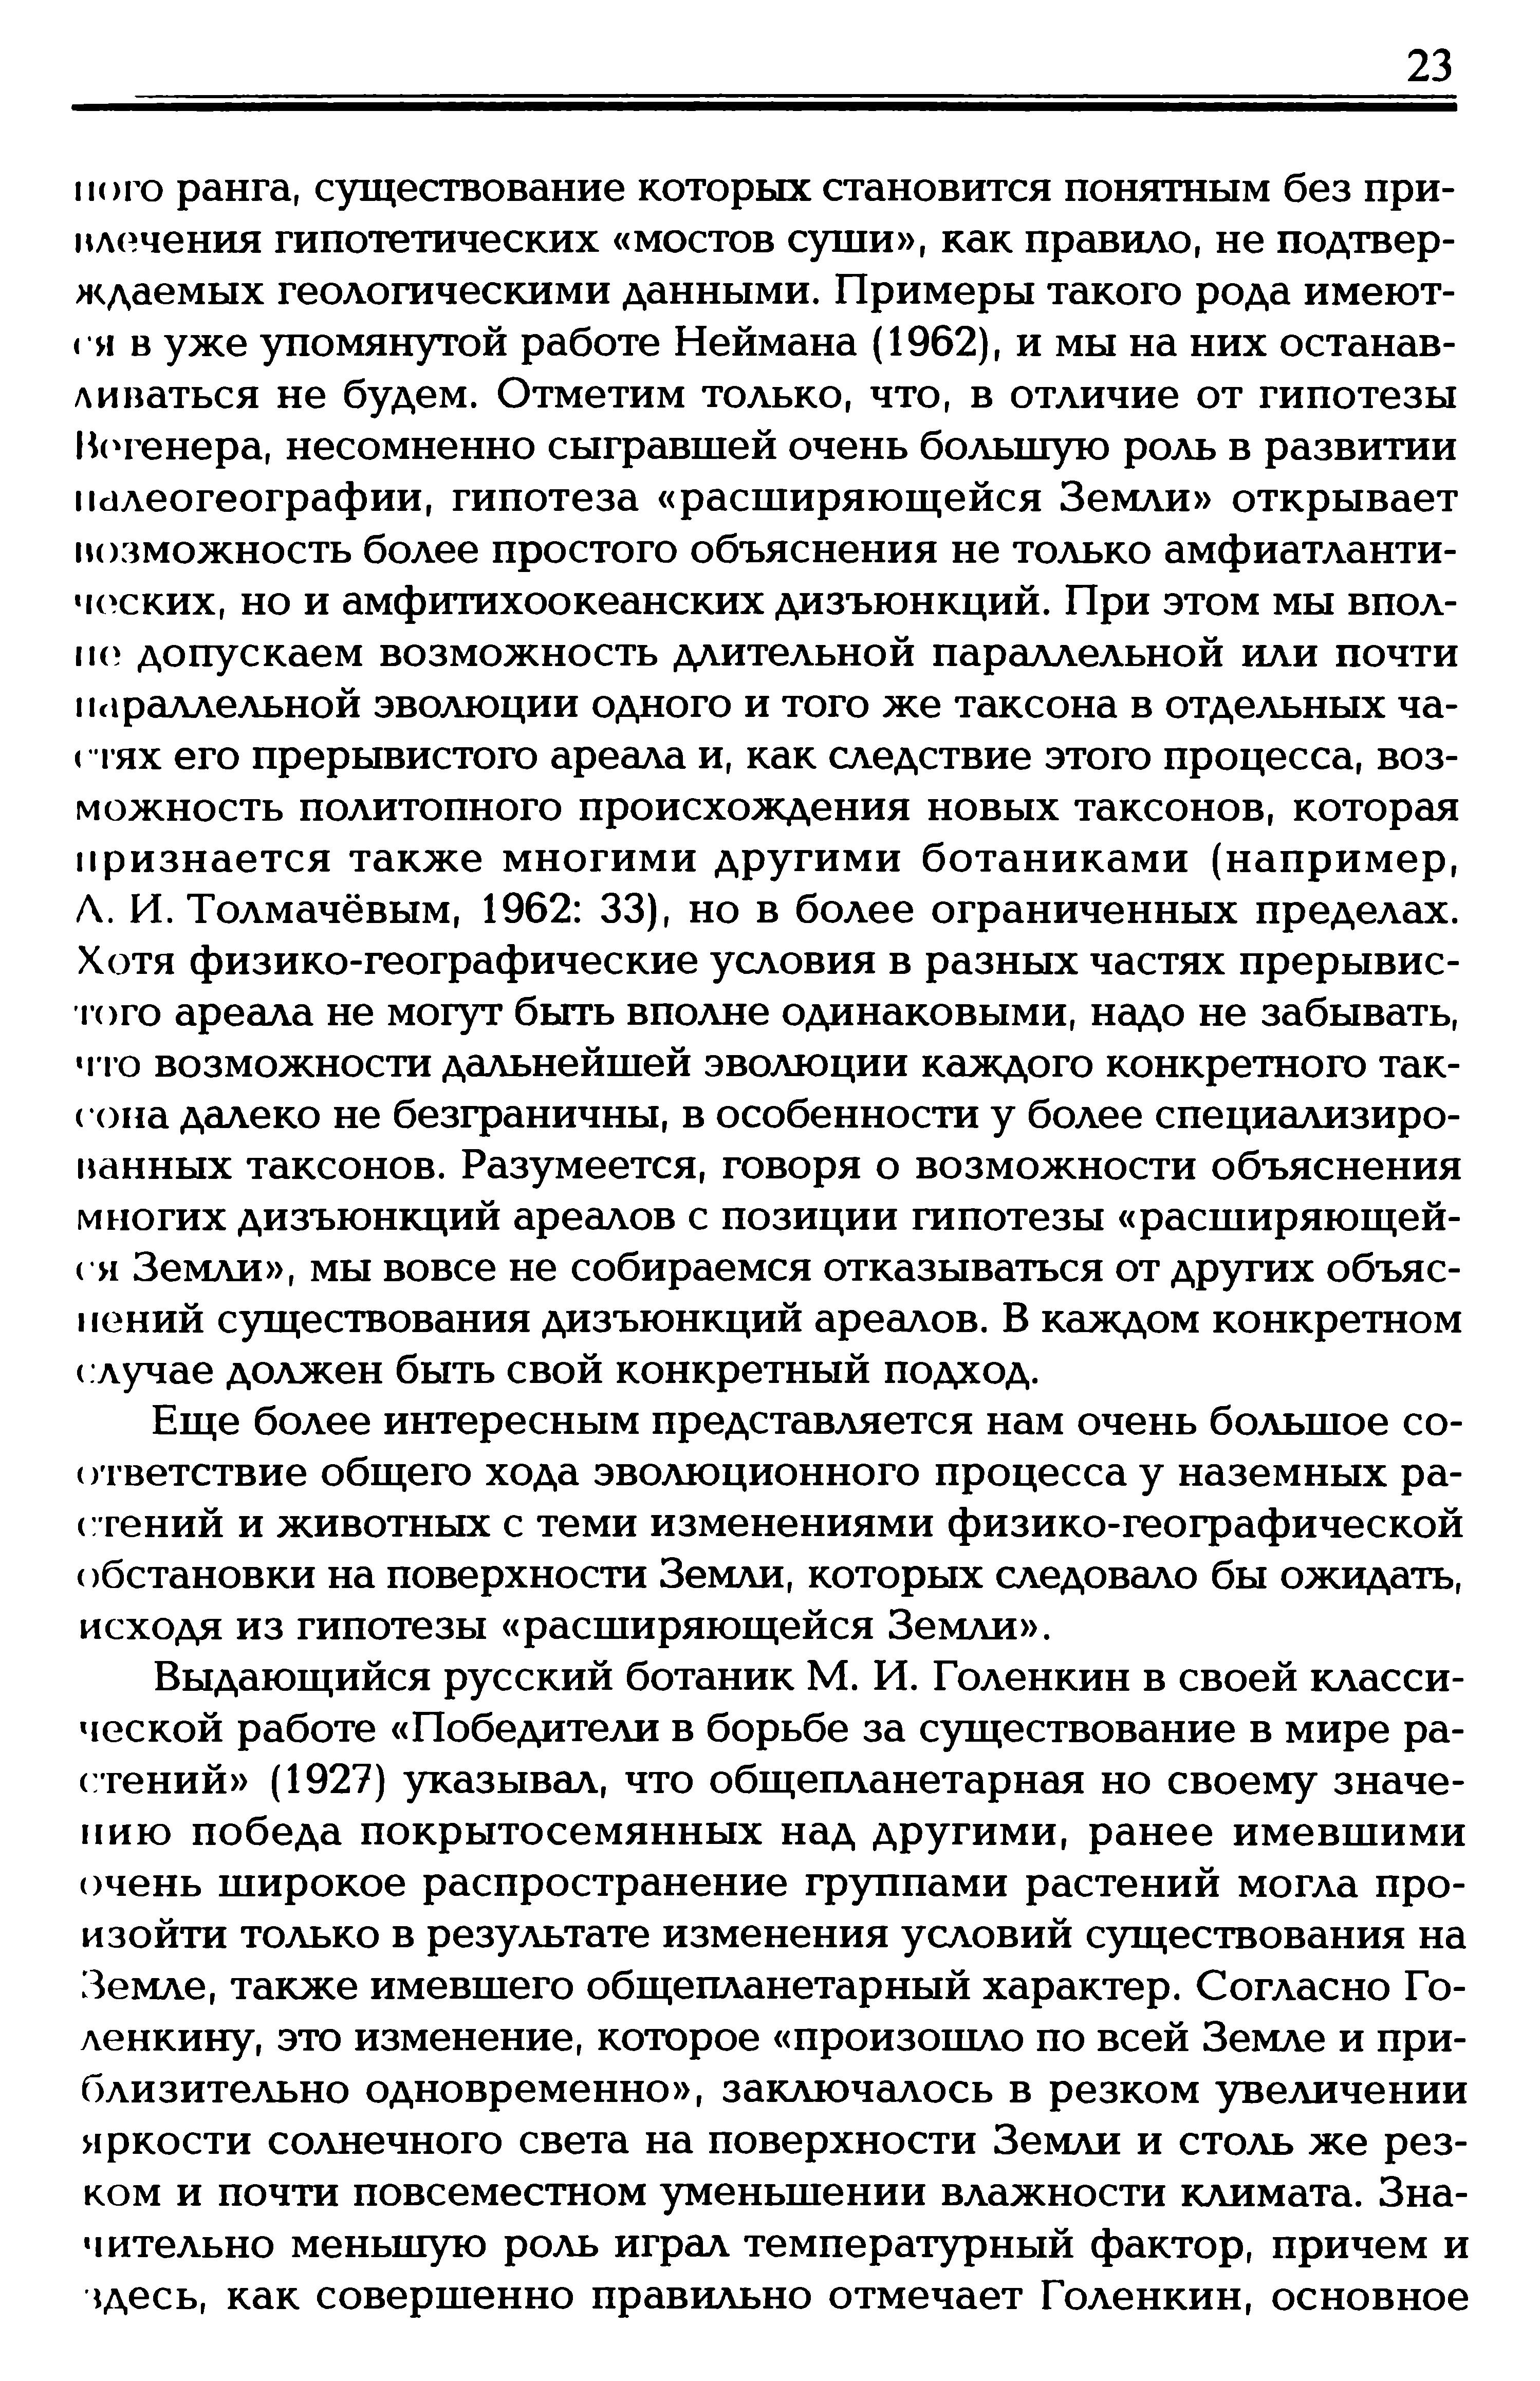 Tzvelev, 2005_1_04.jpeg